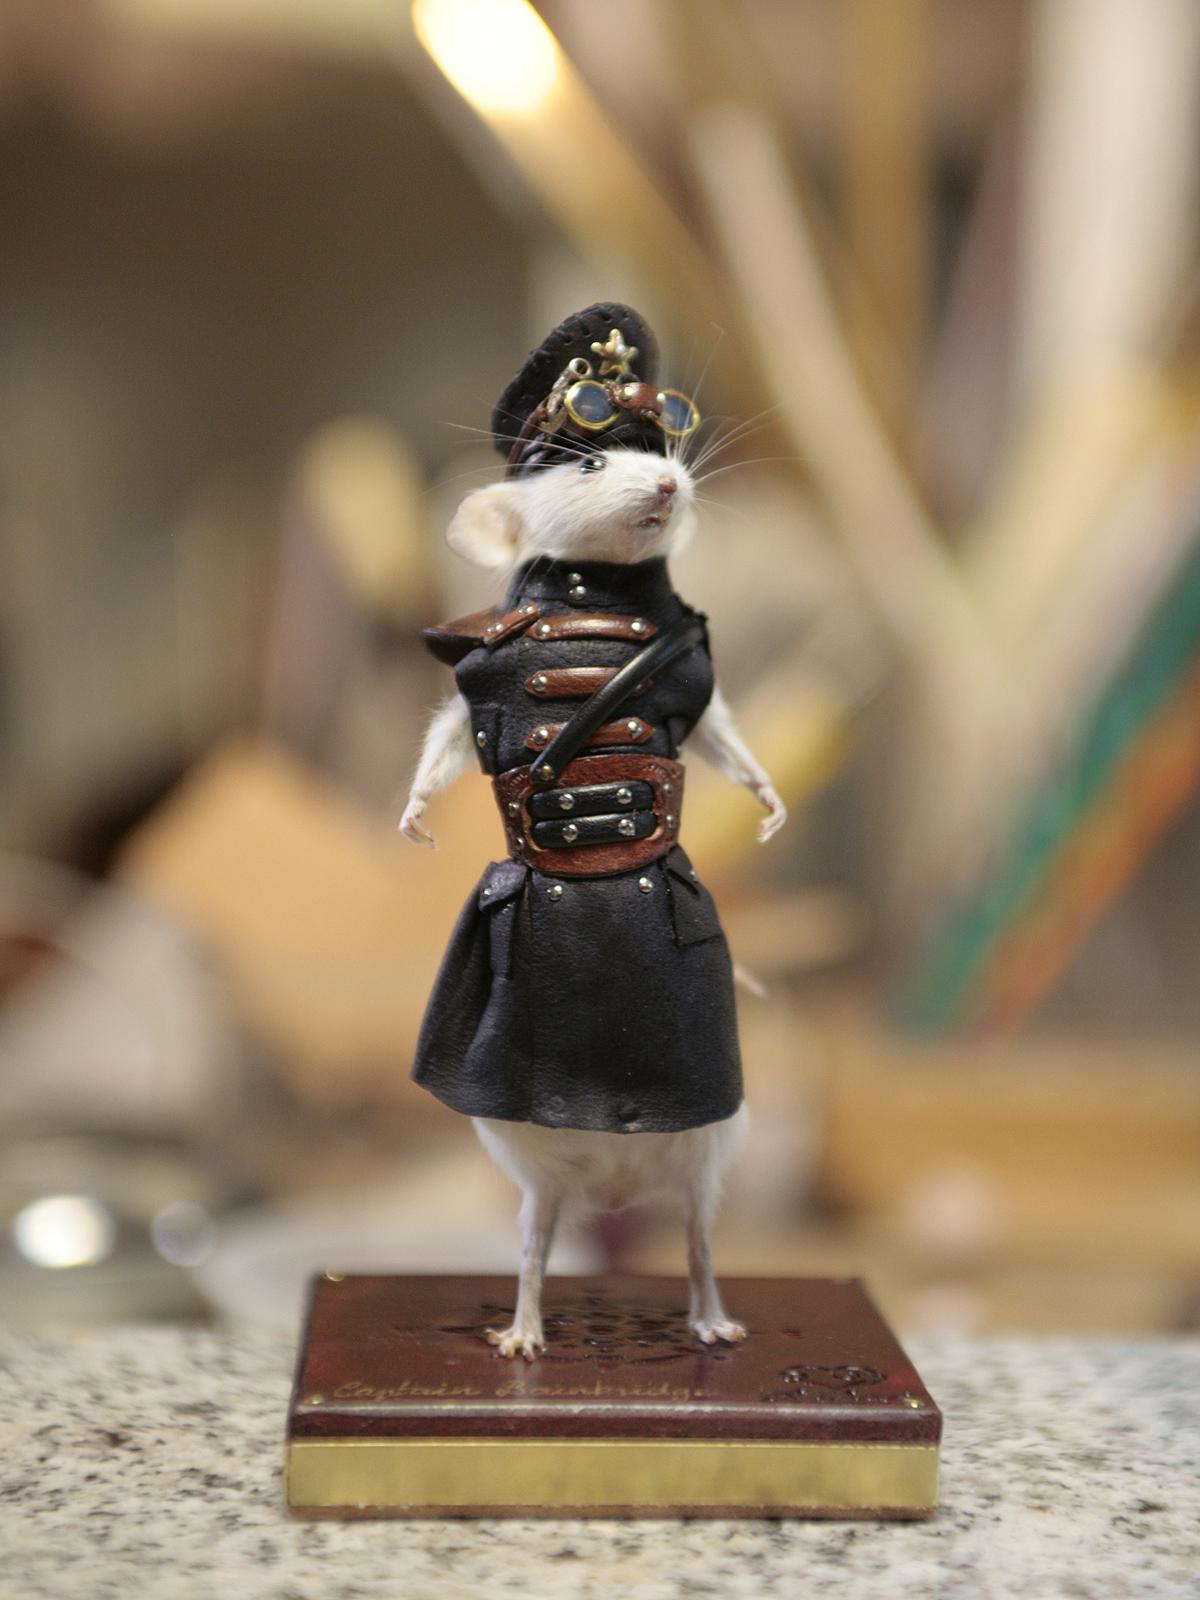 Captain Bainbridge